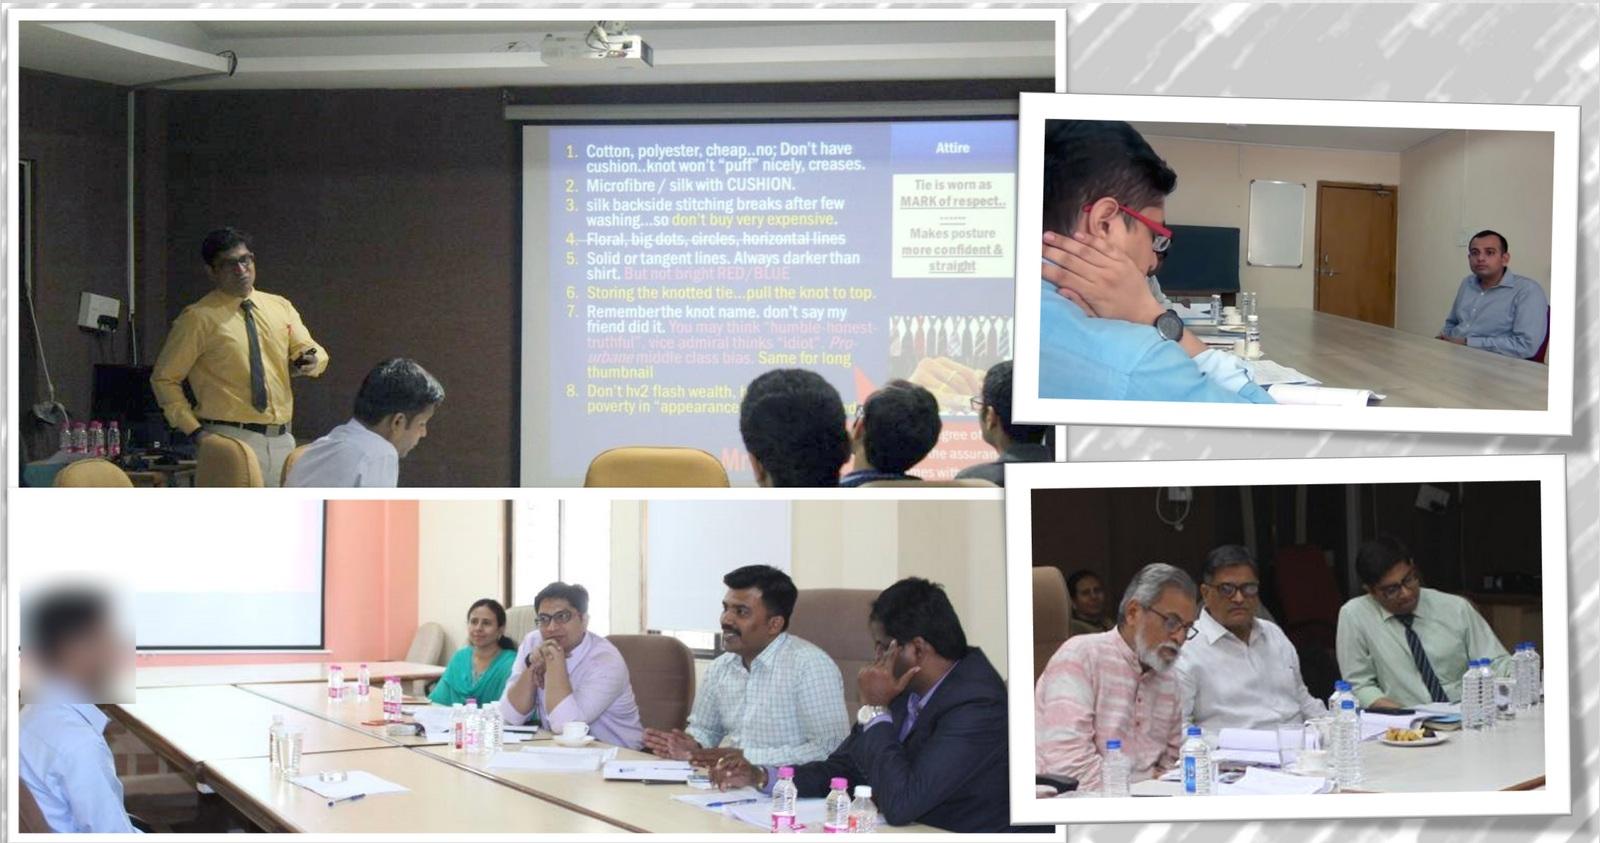 Mrunal conducting UPSC mock interviews